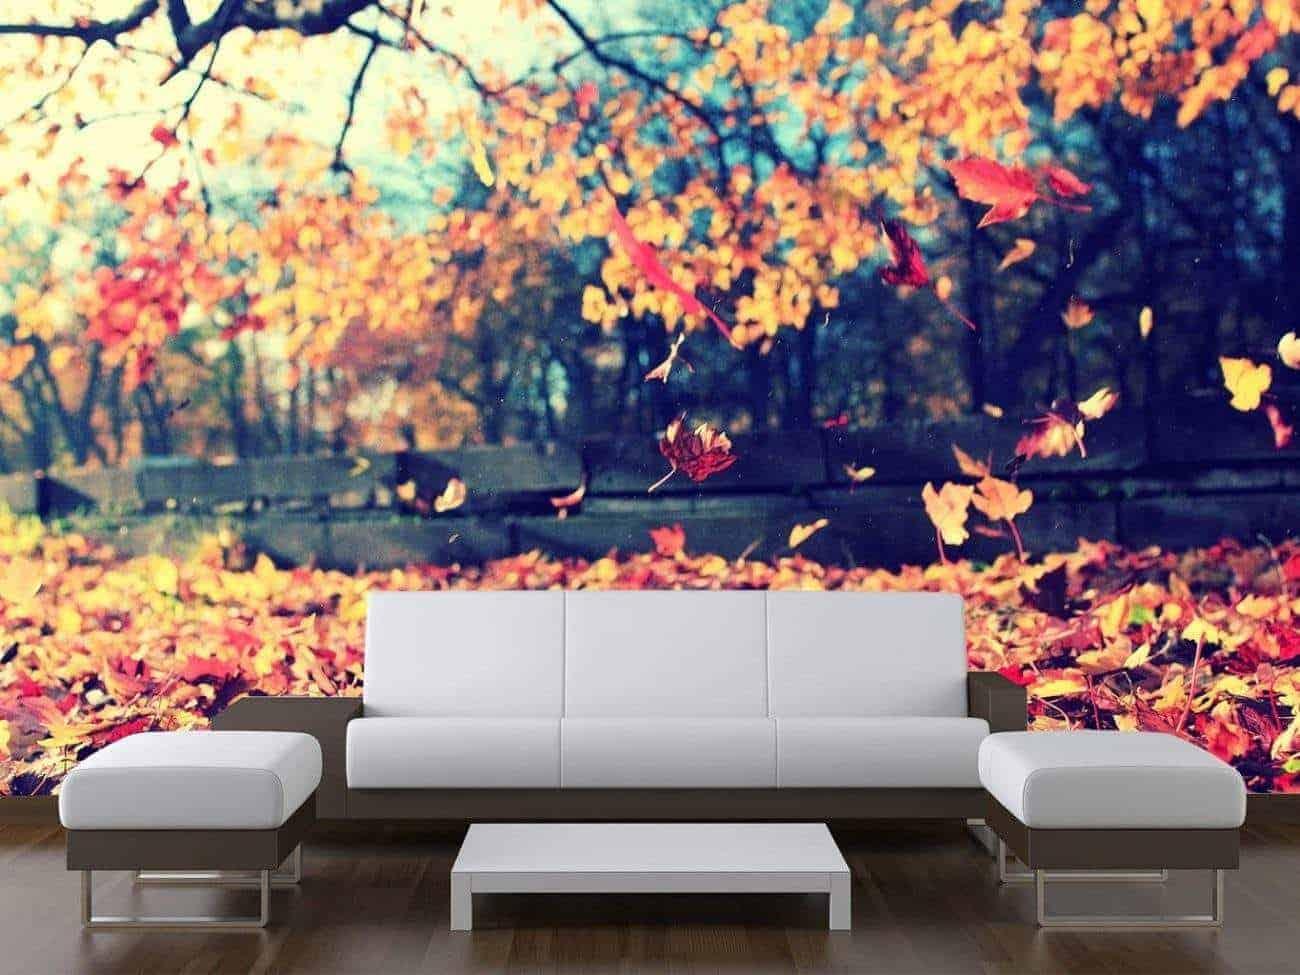 Falling Autumn Leaves Wall Mural